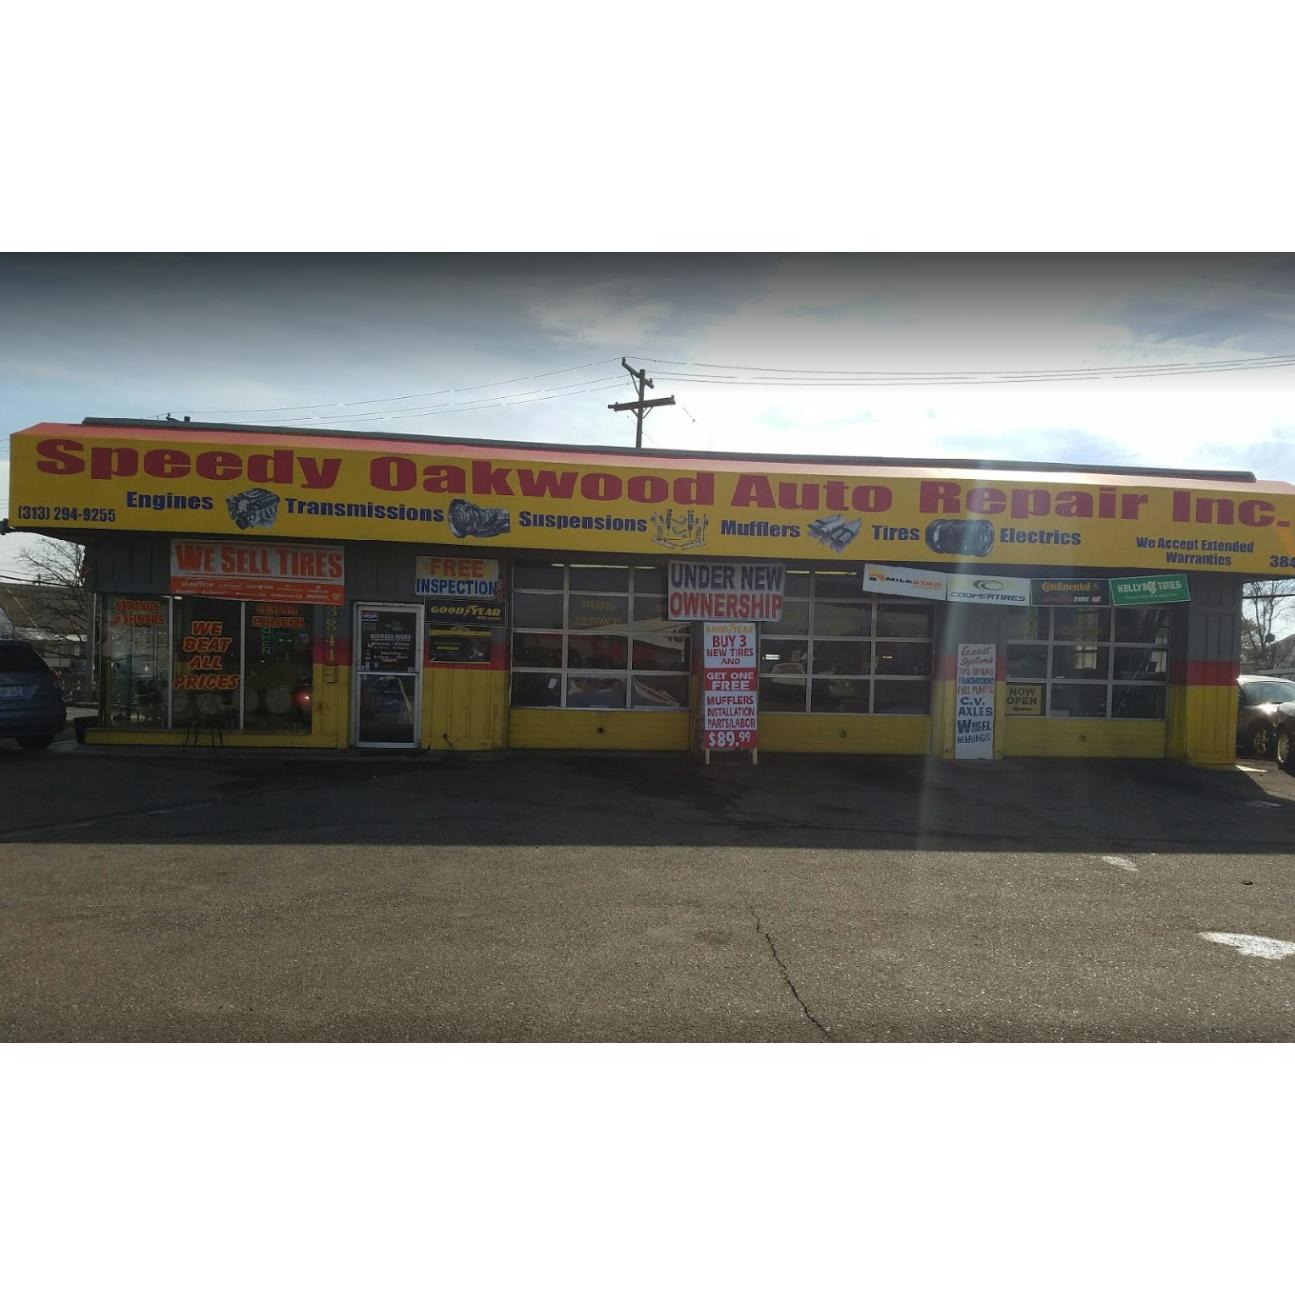 Speedy Oakwood Auto Repair Inc Melvindale Michigan Mi